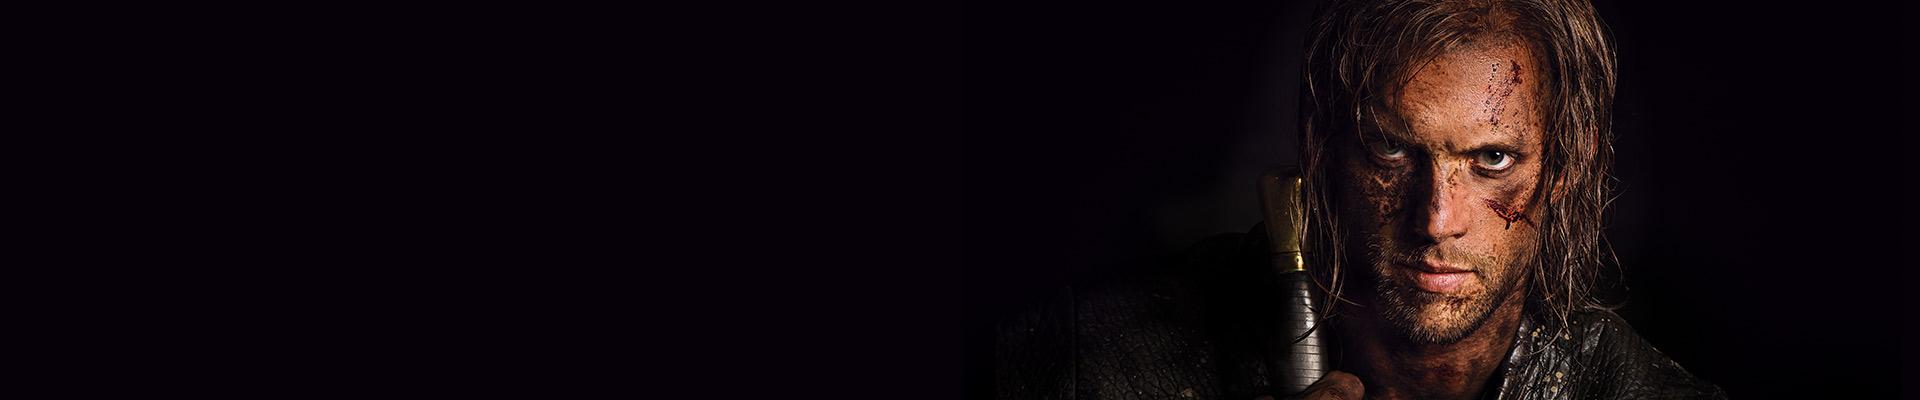 Promo image from Macbeth